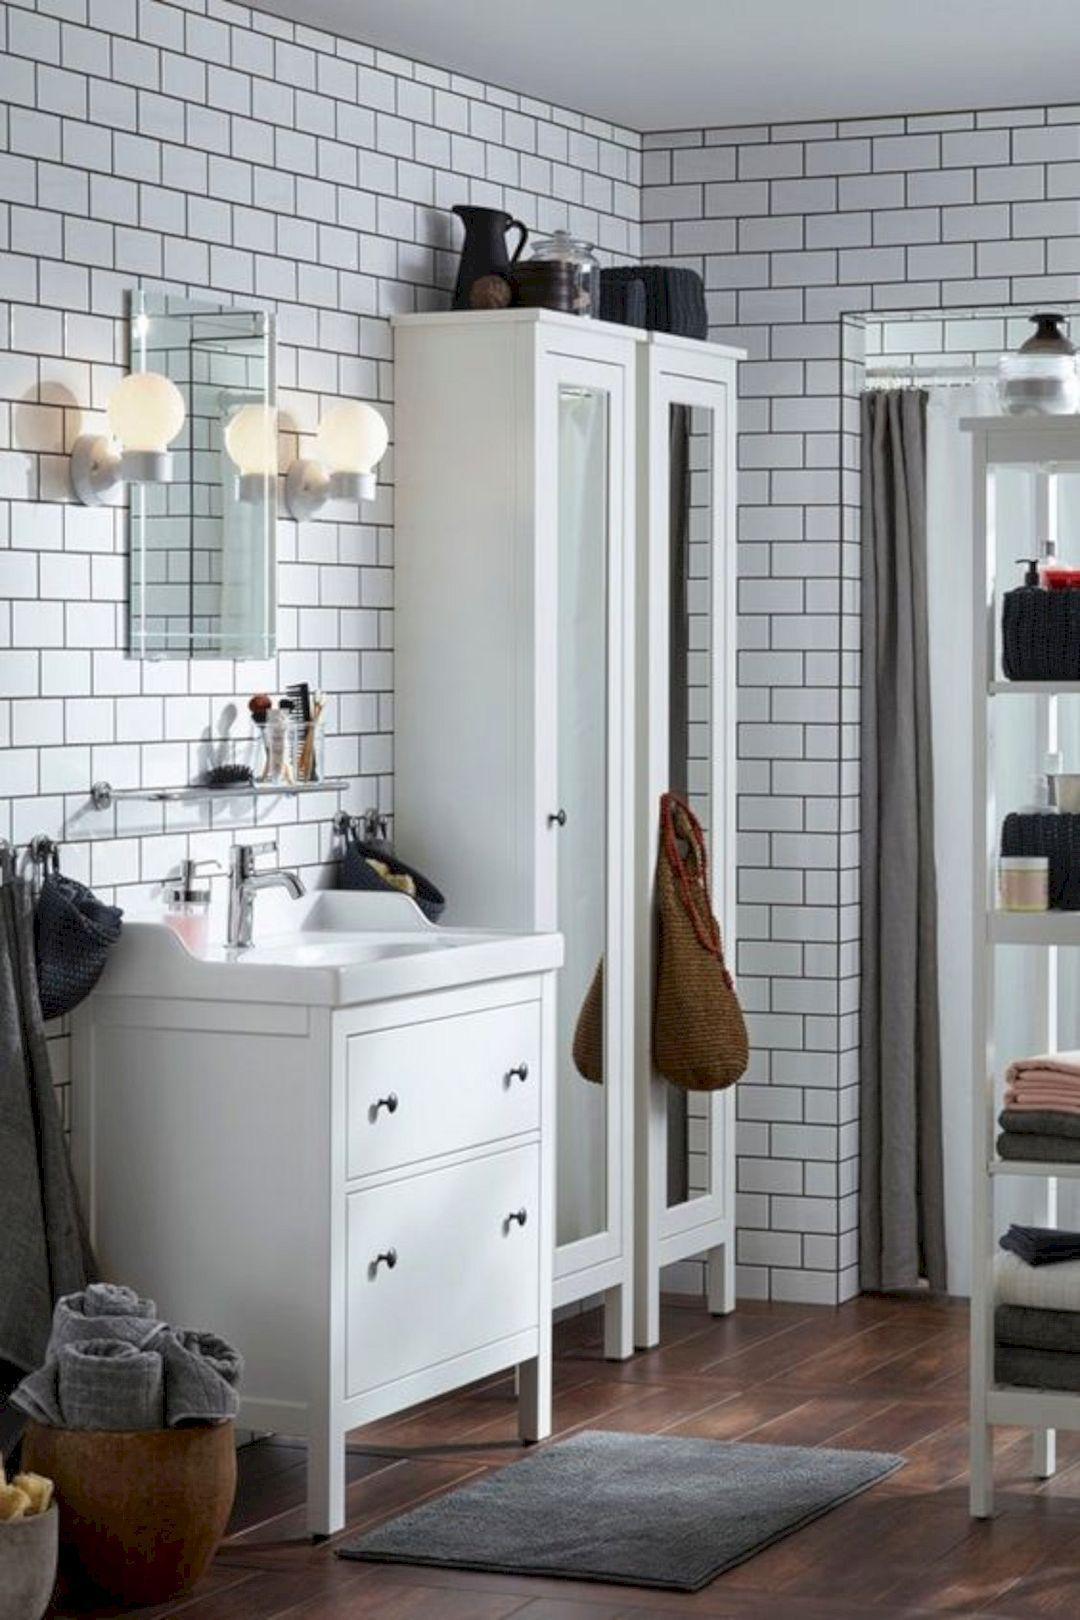 15 Inspiring Bathroom Design Ideas With Ikea Bagno Ikea Bagno